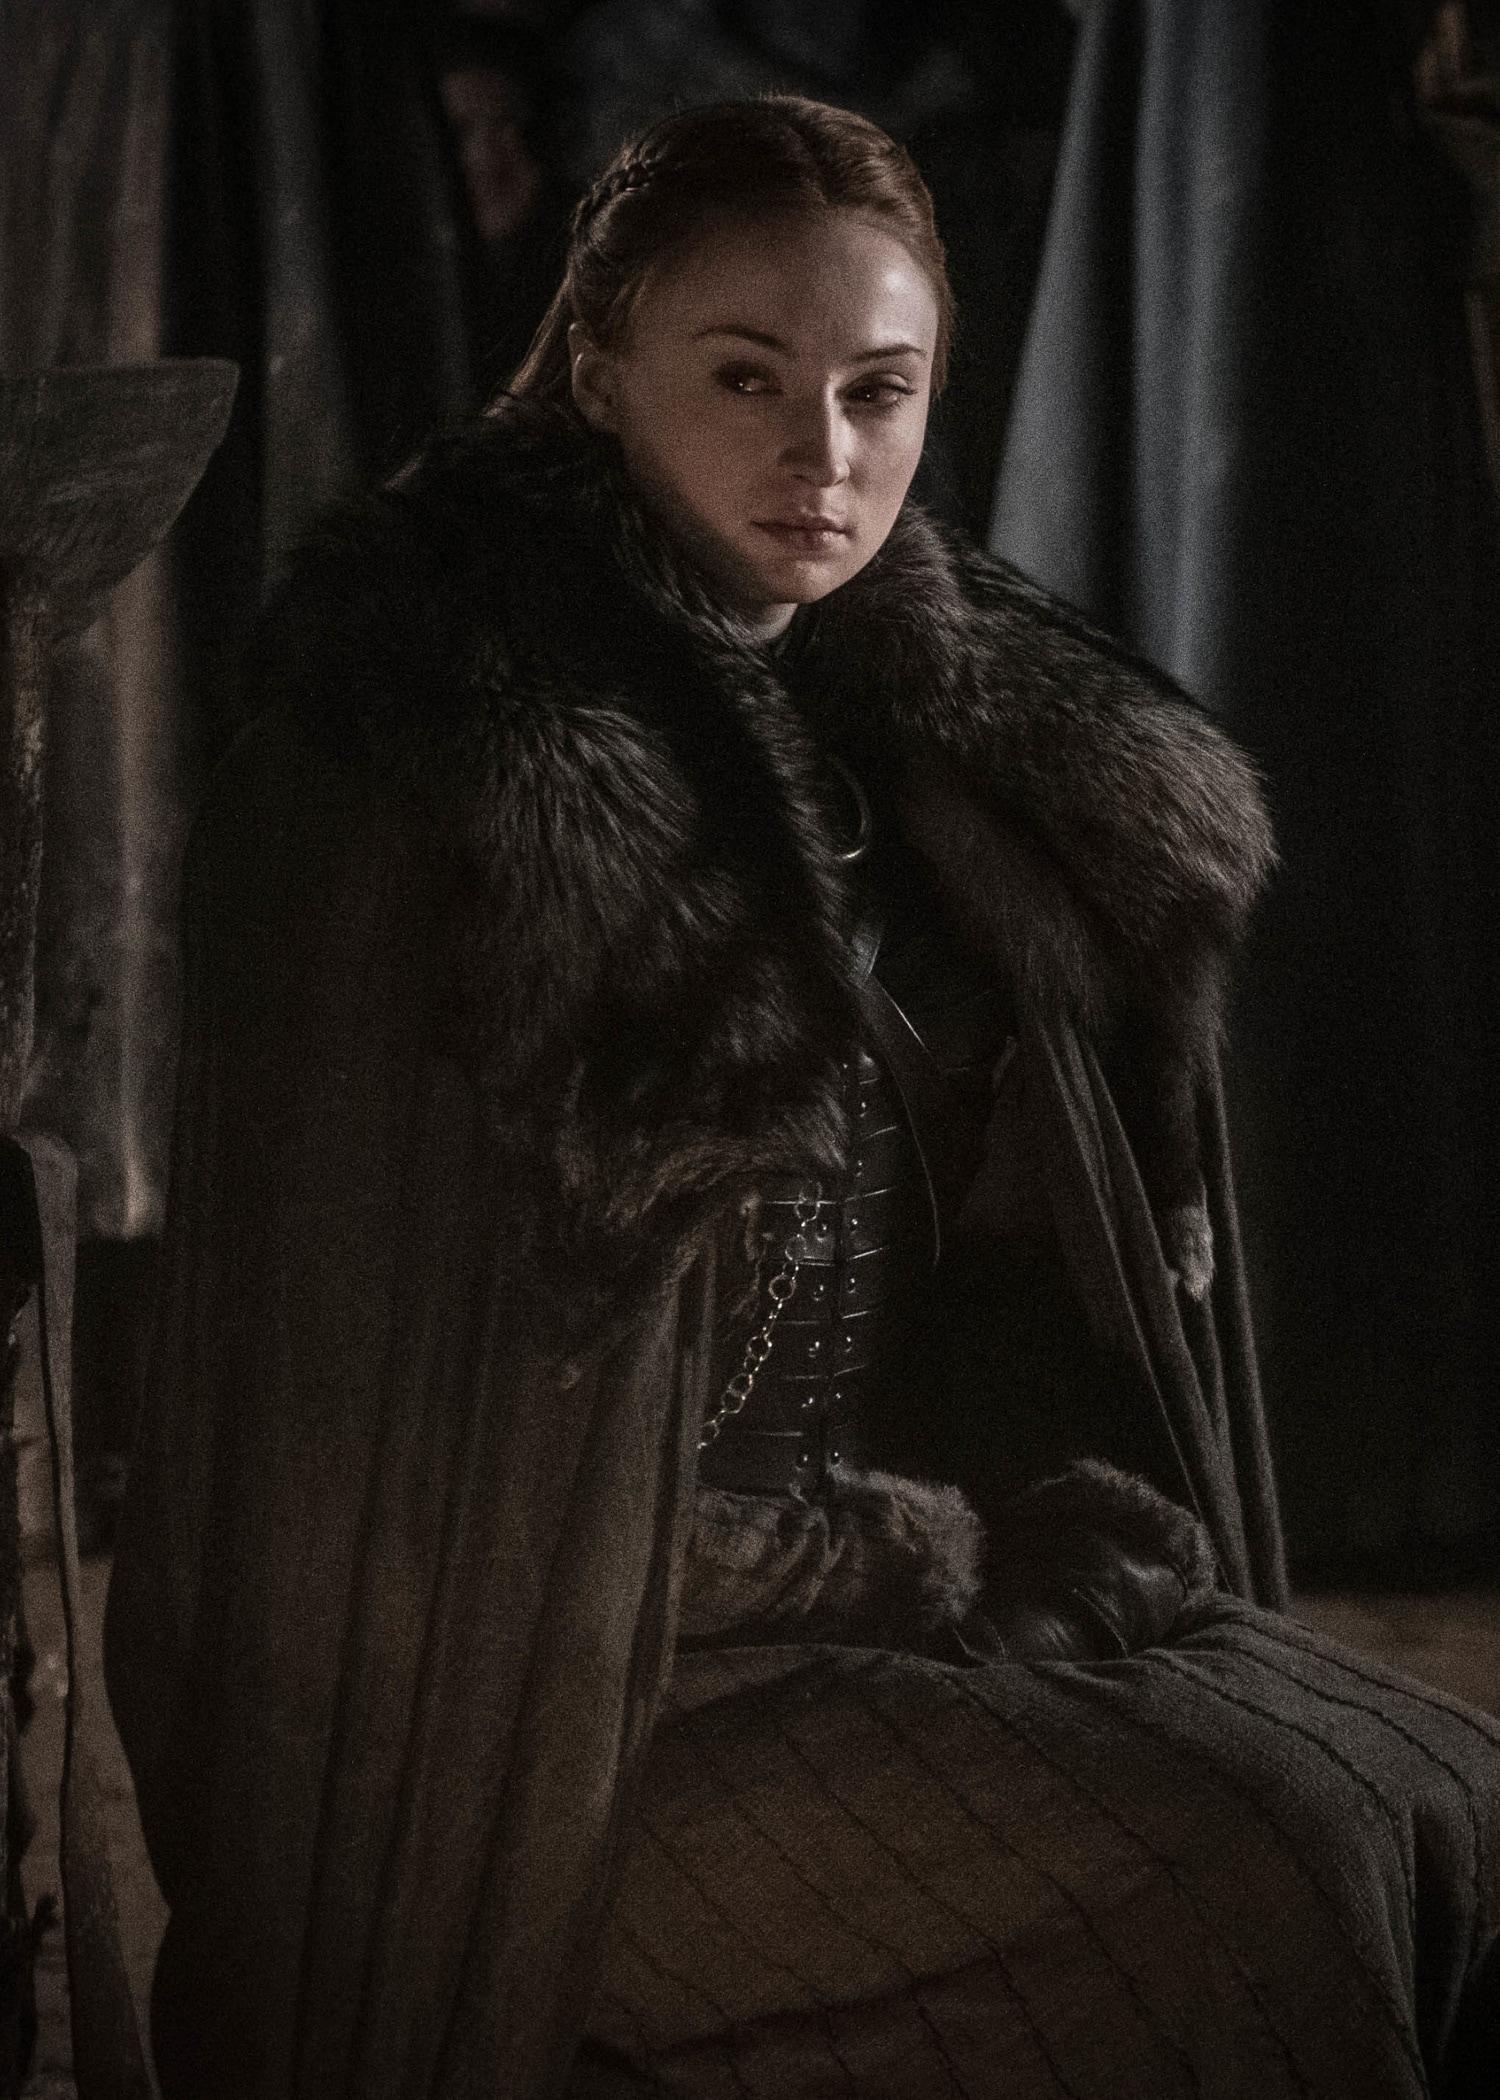 Game Of Thrones Season 8 Episode 3 Bangla Subtitles game of